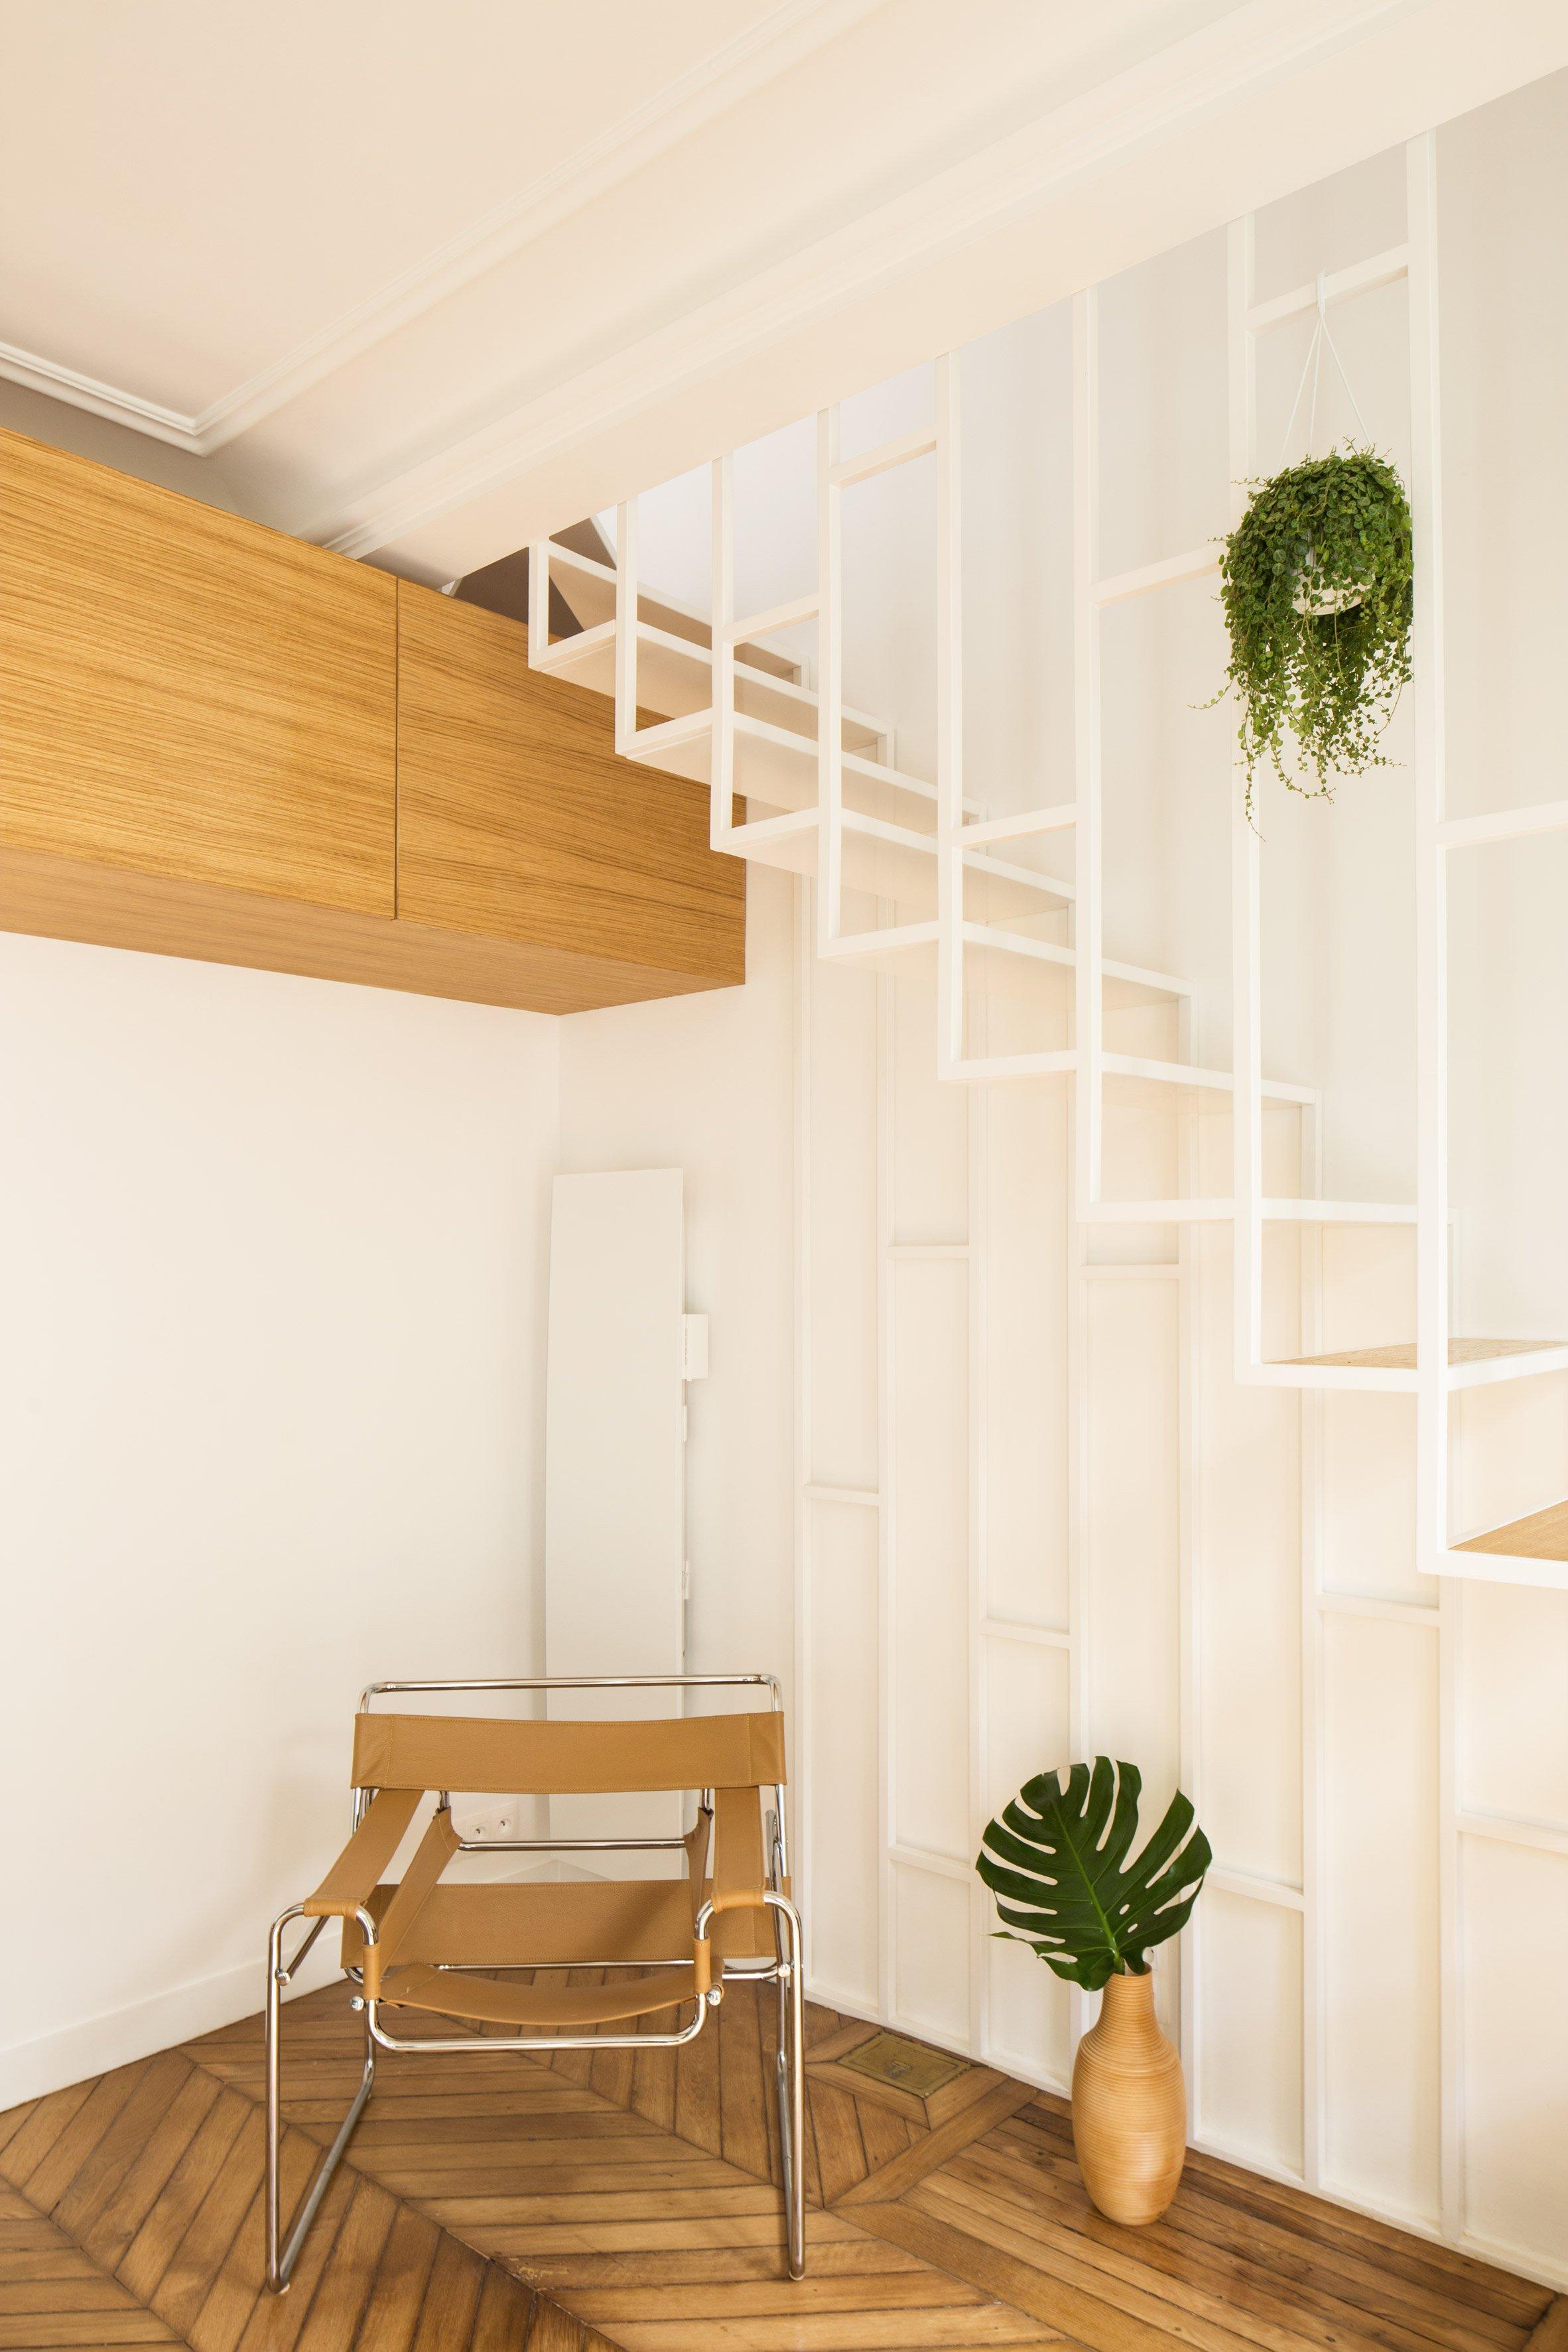 architecture-paris-apartment-design-studia-interiors-osnovadesign-osnova-poltava_06